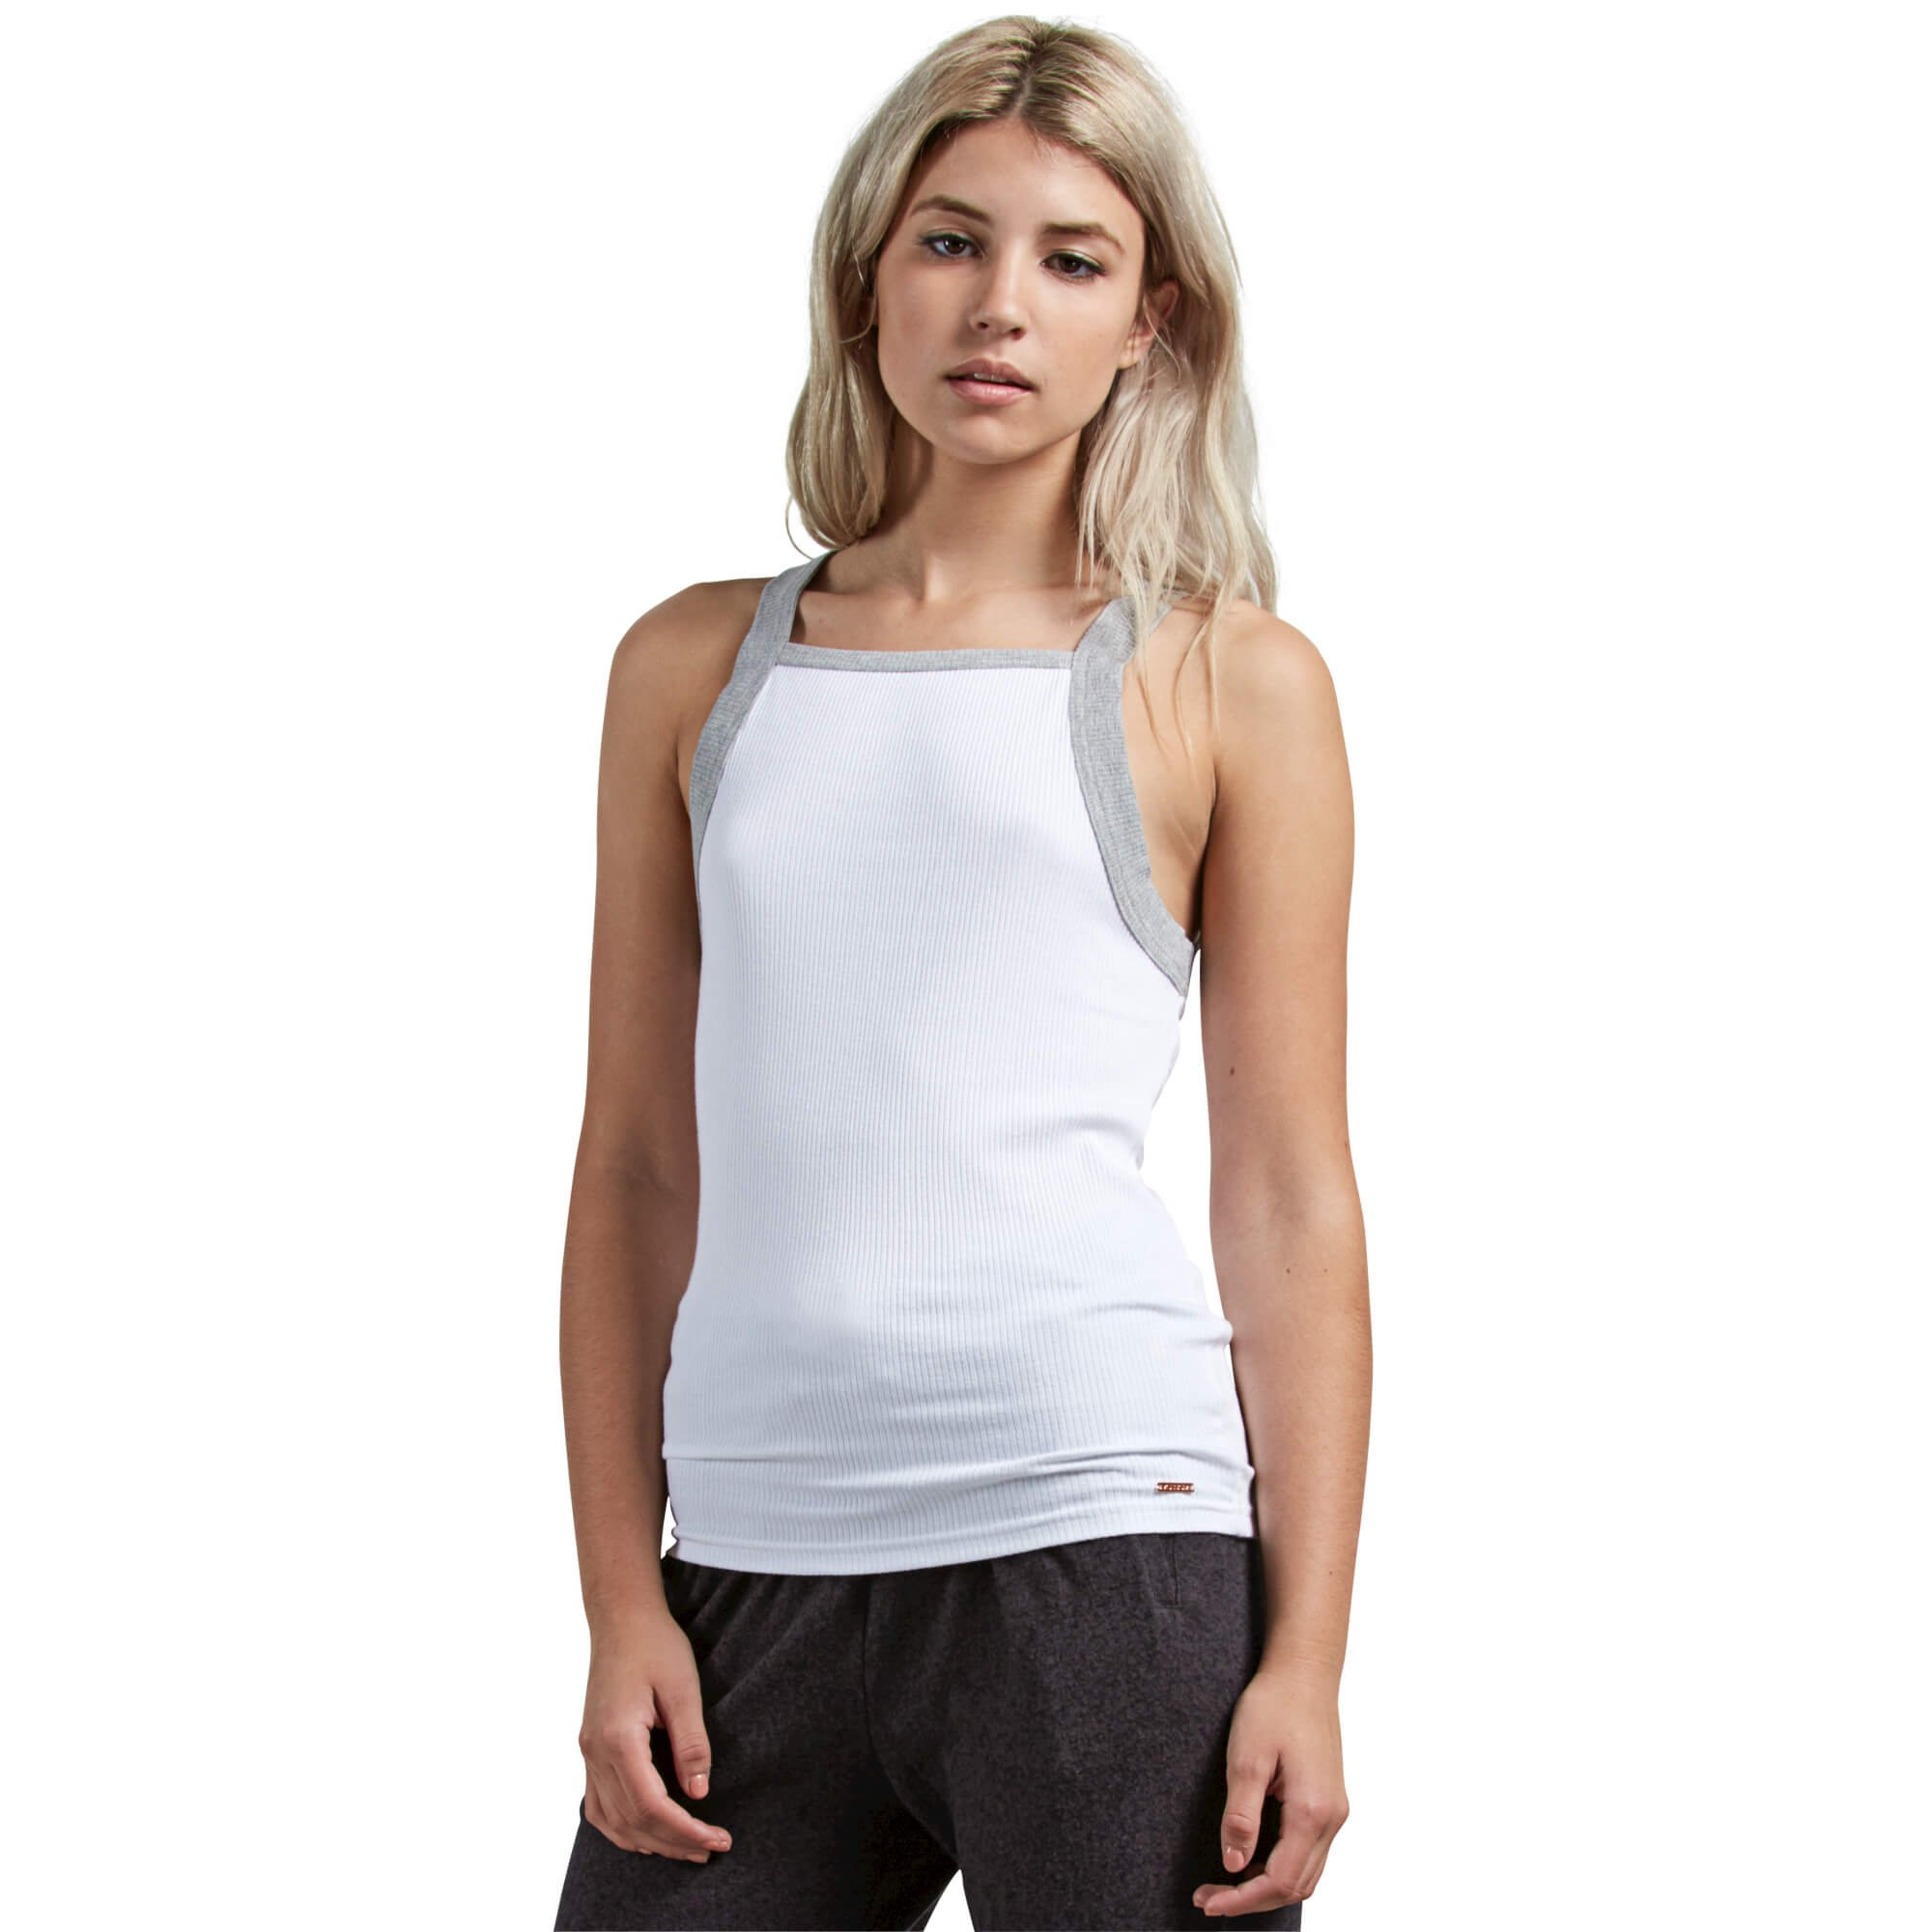 Volcom Junior's Lil Fitted Rib Basics Tank top Shirt, White, Extra Large